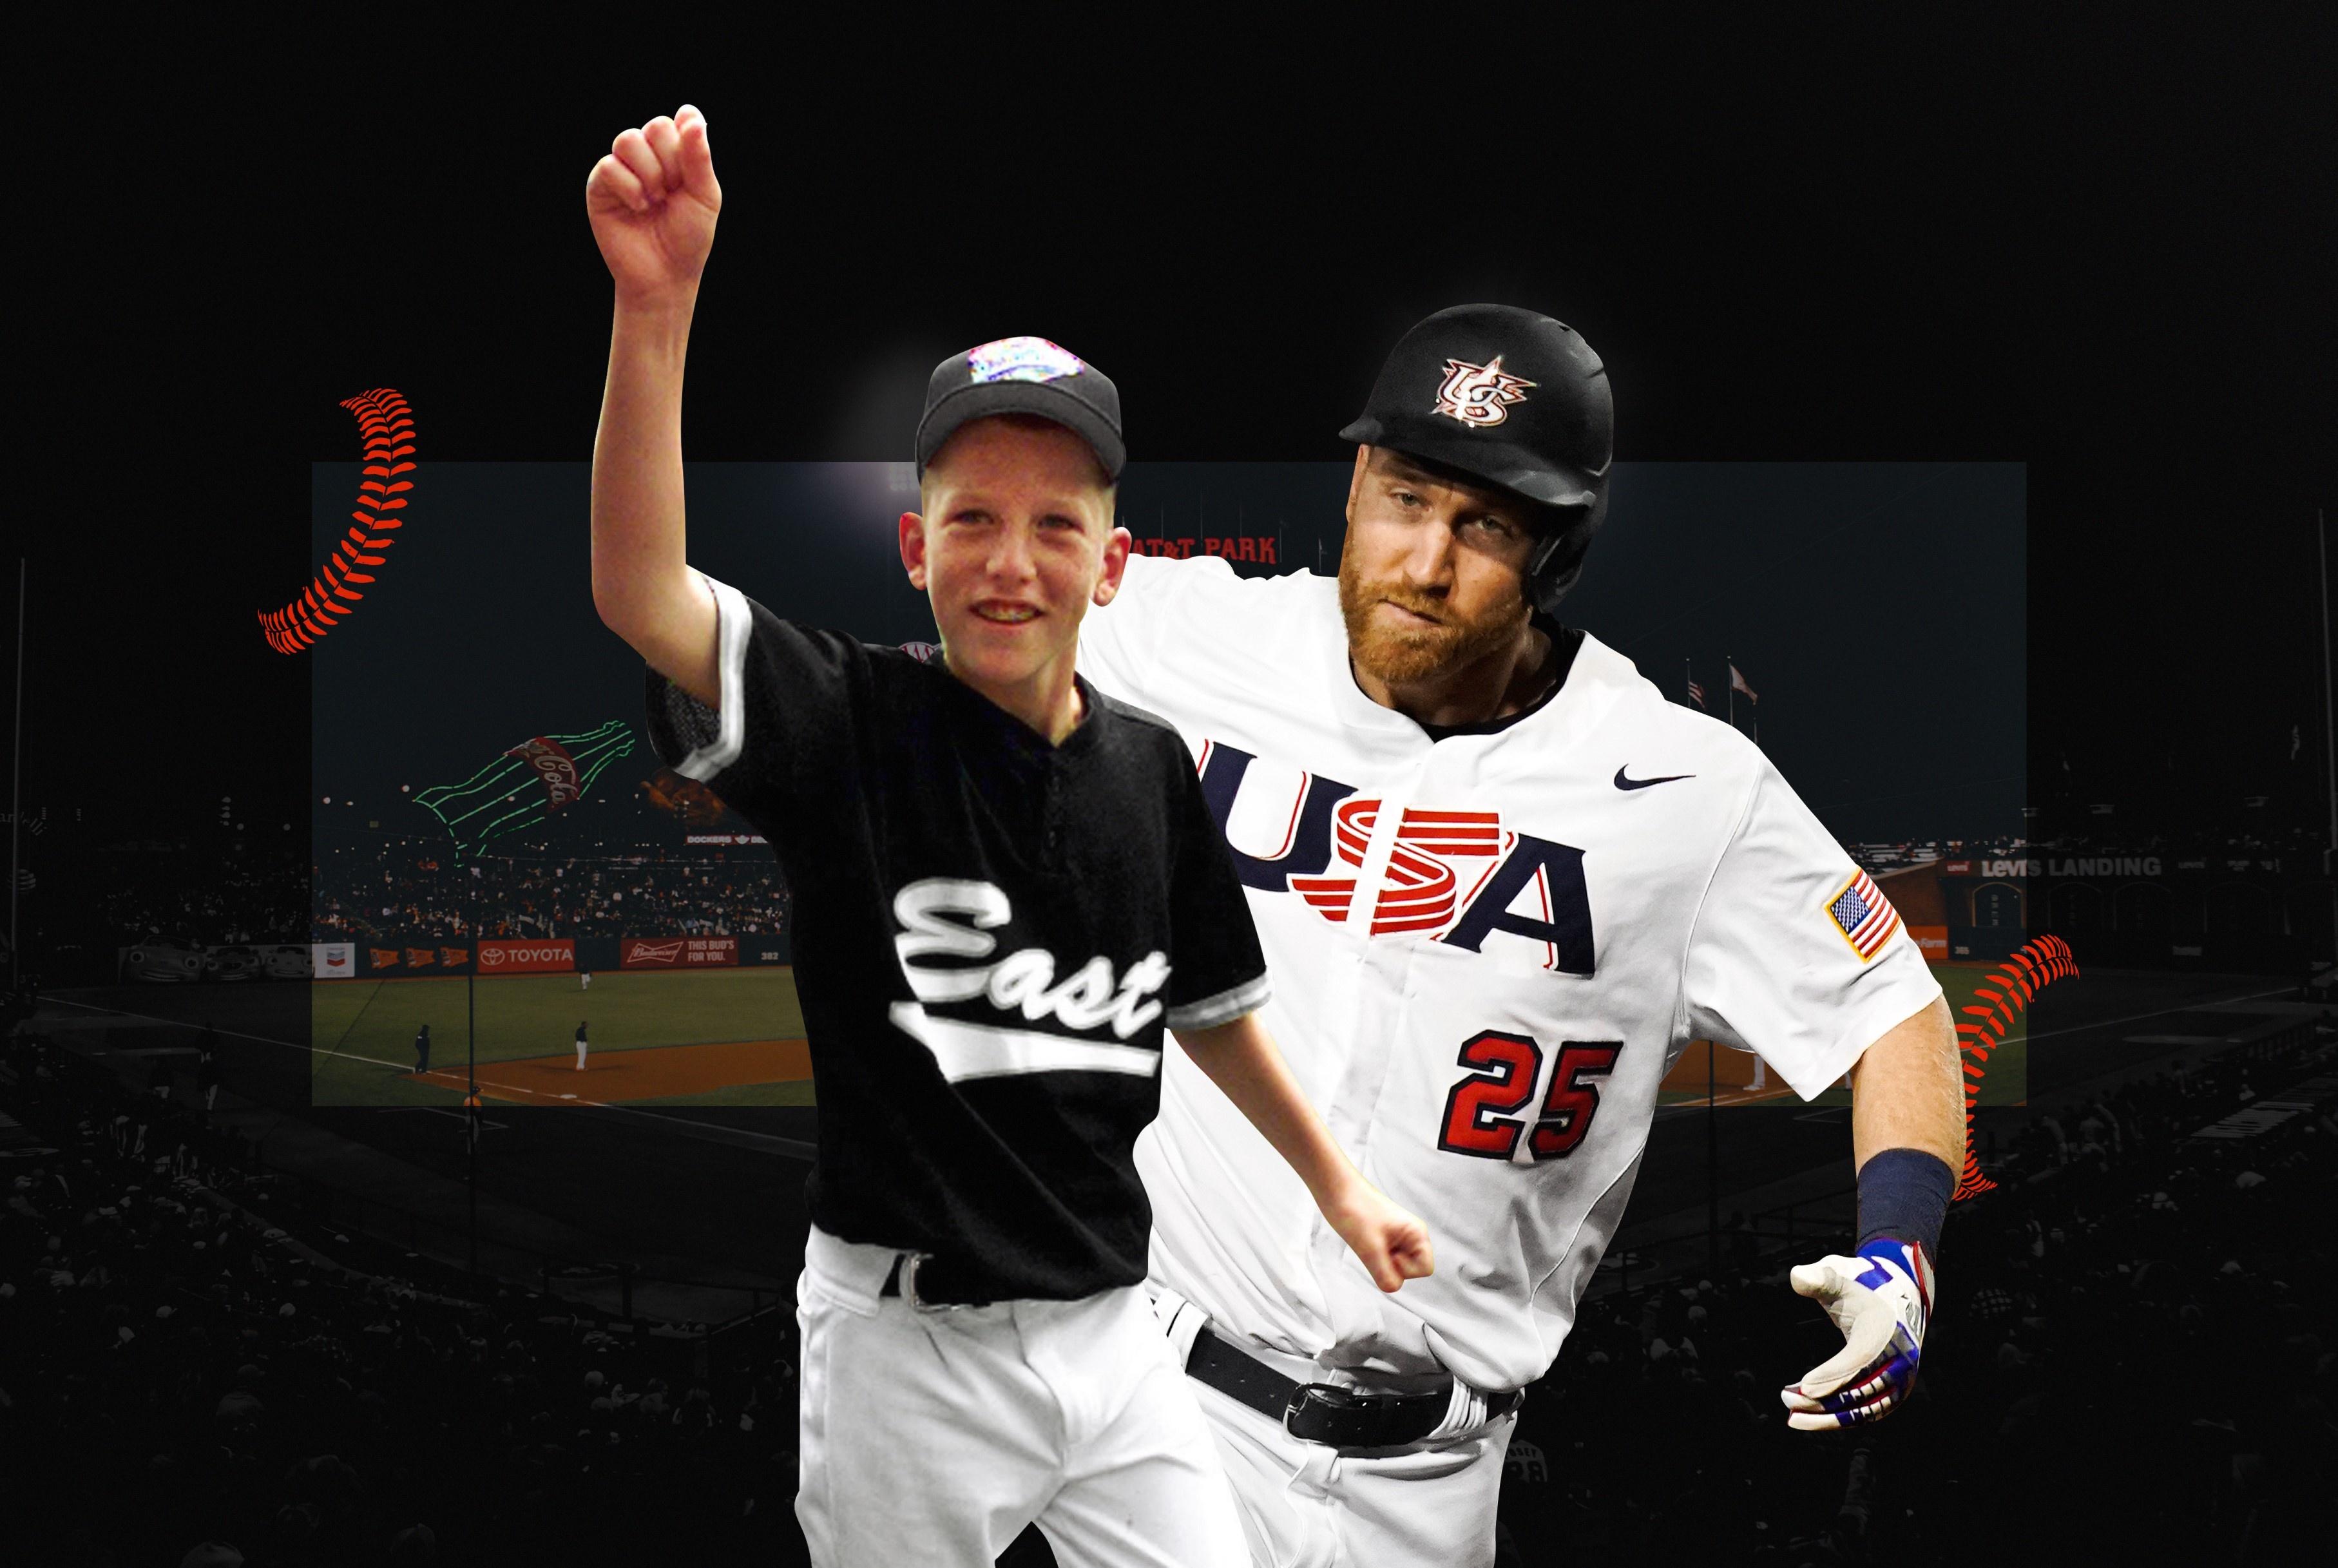 The Toddfather Leads USA Baseball to the Tokyo Olympics